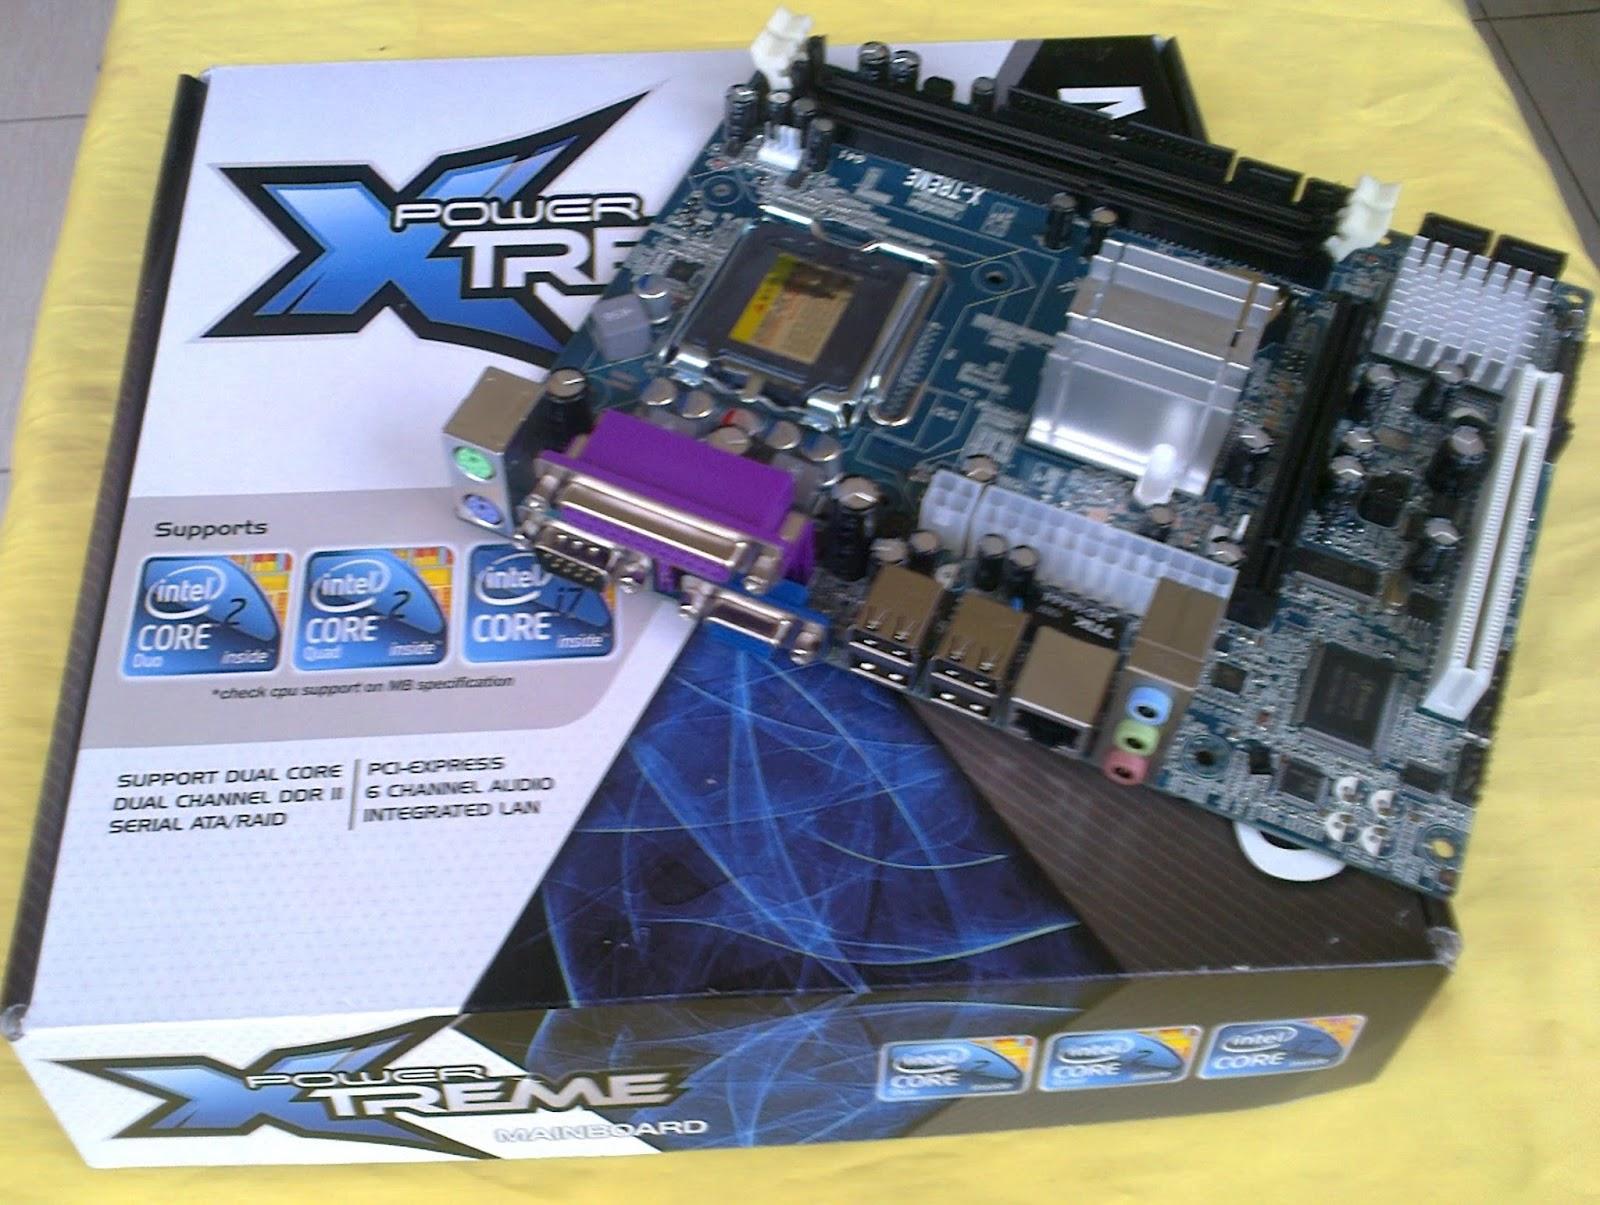 Galang Komputer Komponen Baru Processor Core I5 2400 Tray Tanpa Fan Socket 1155 Mainboard New